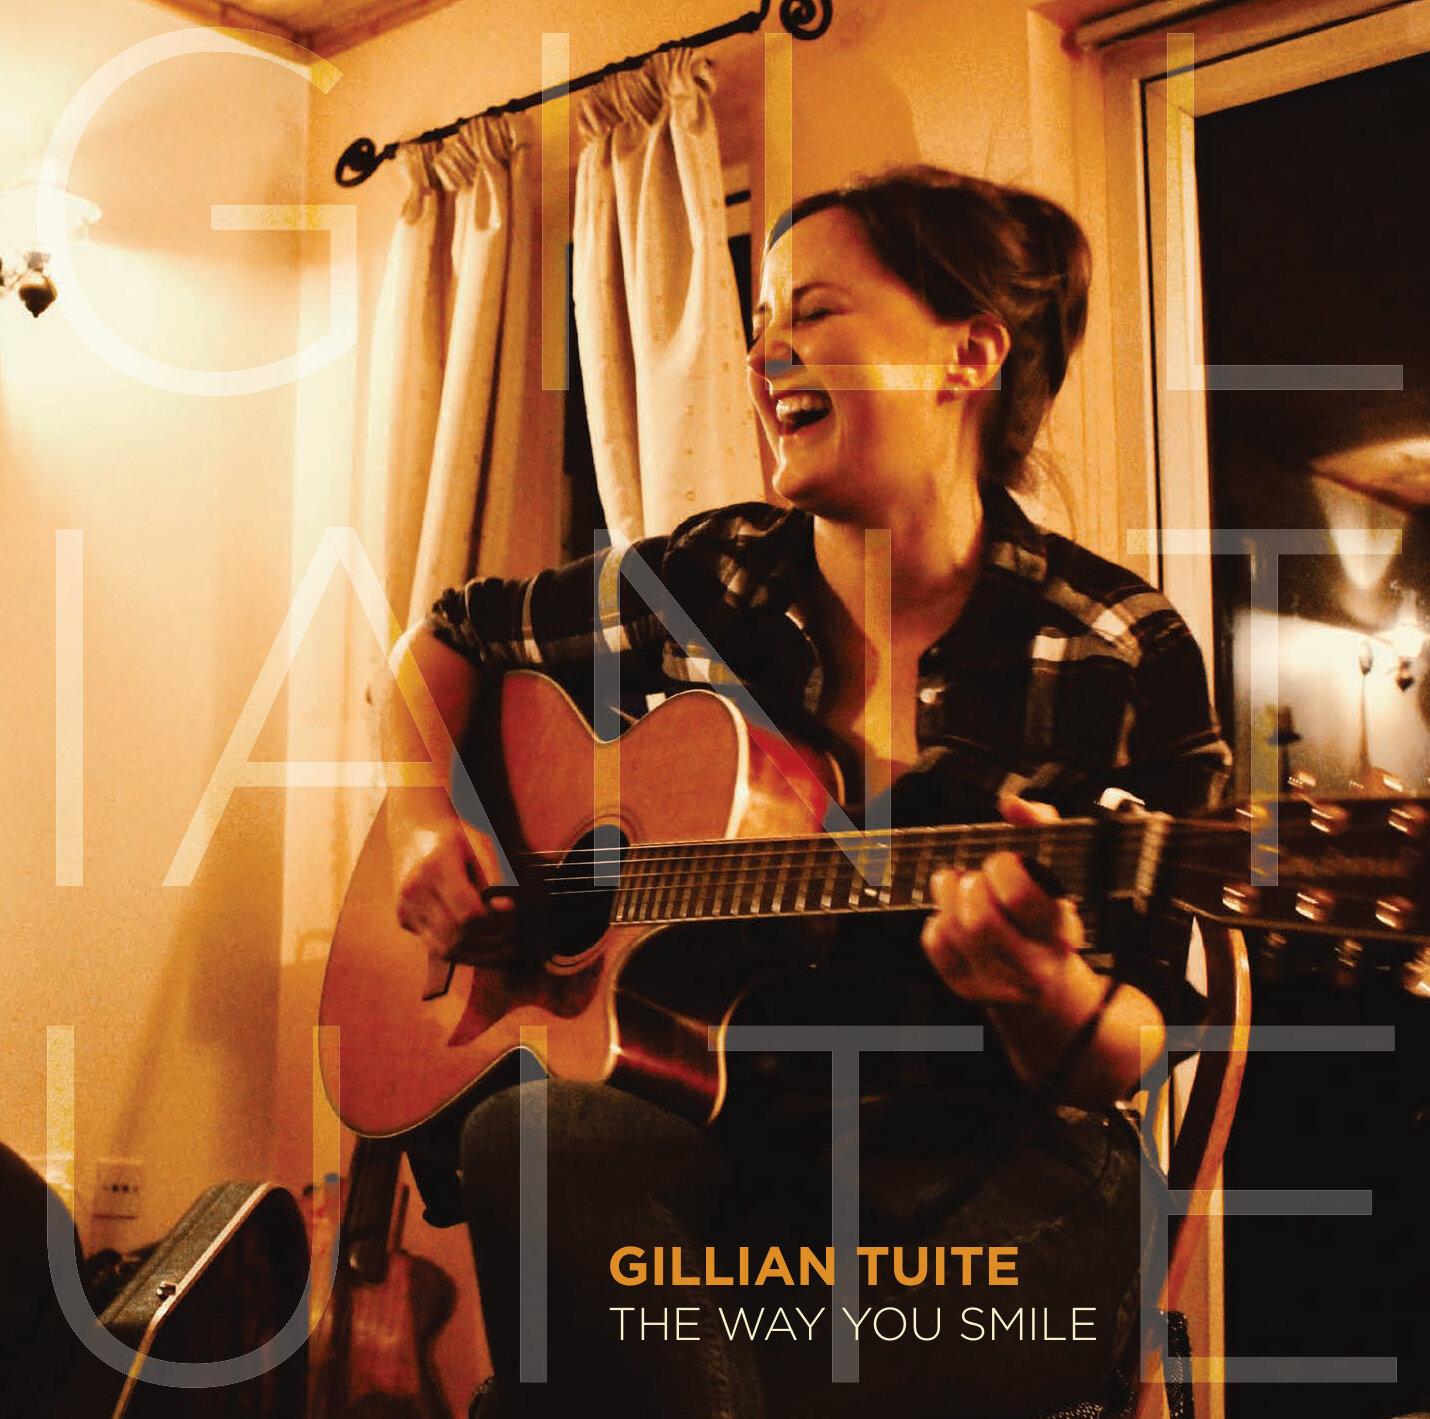 Gillian_Tuite_TheWayYouSmile_Cover.jpg